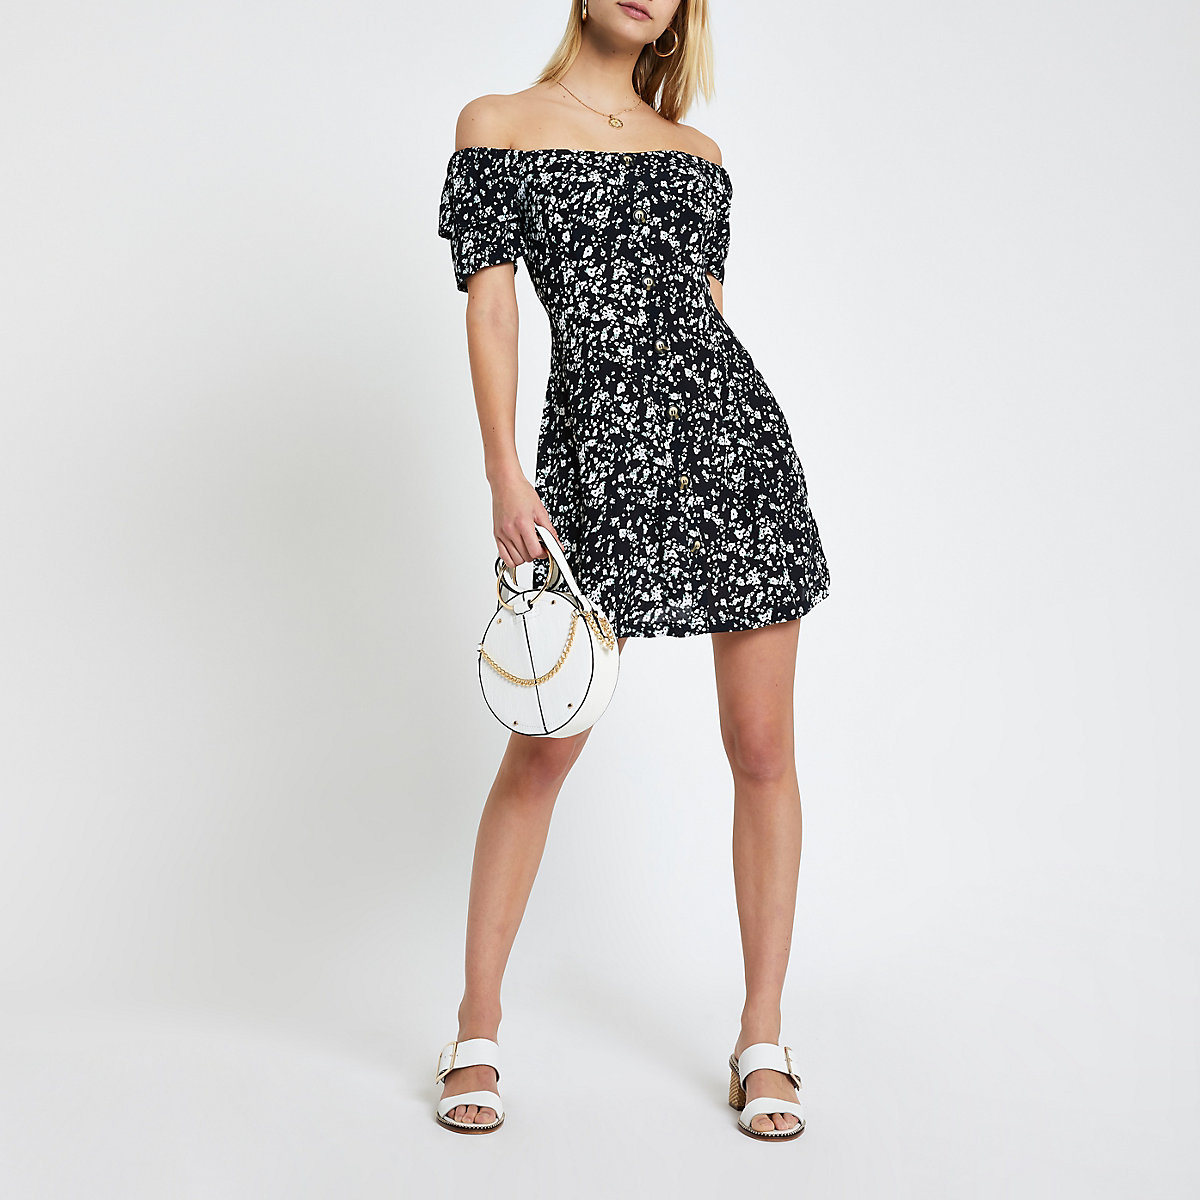 Black floral bardot button front dress